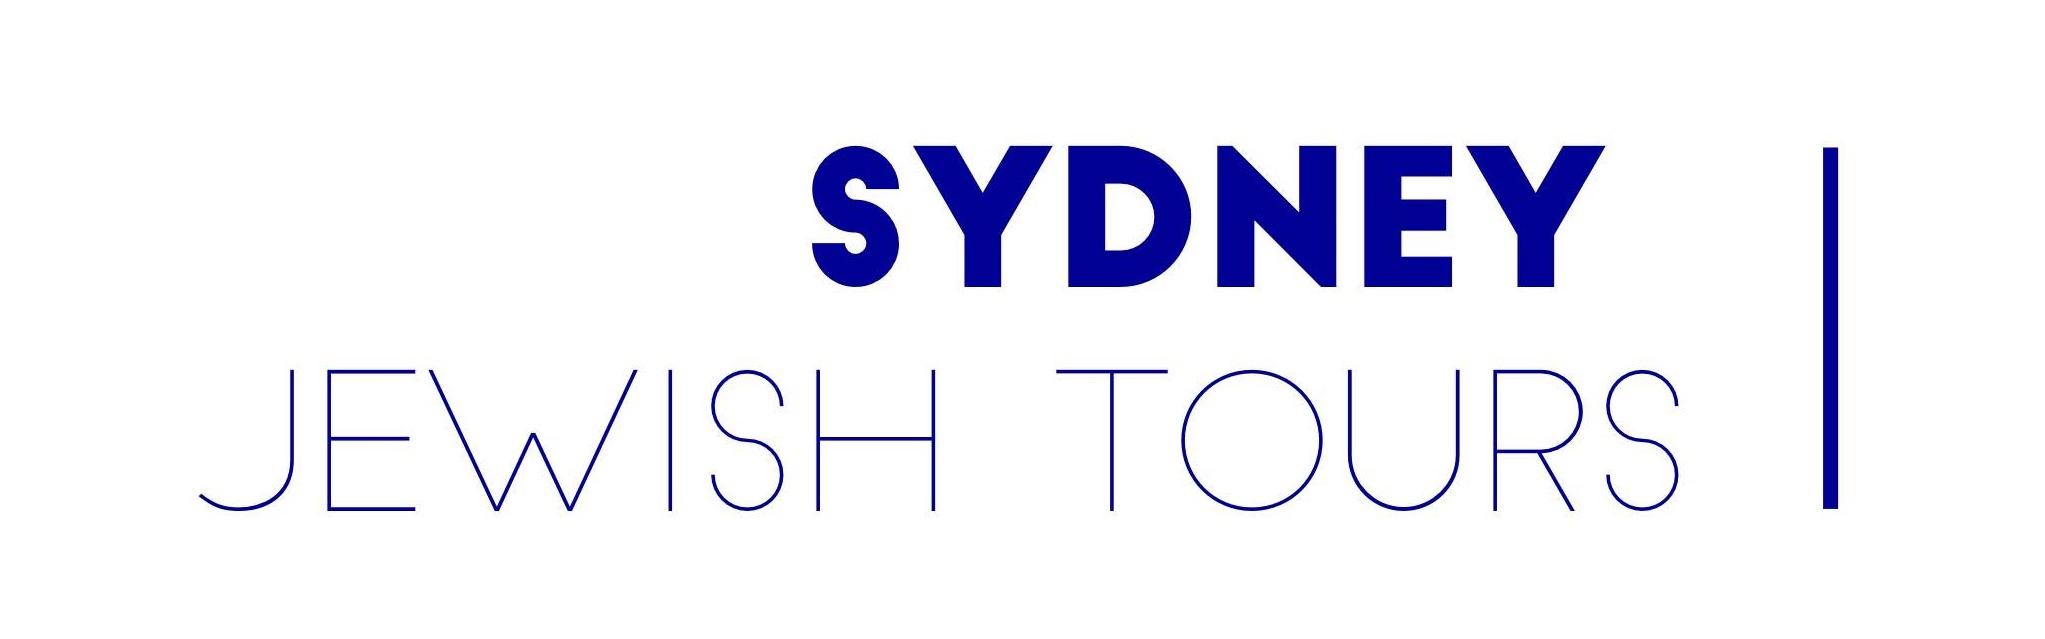 Sydney Jewish Tours